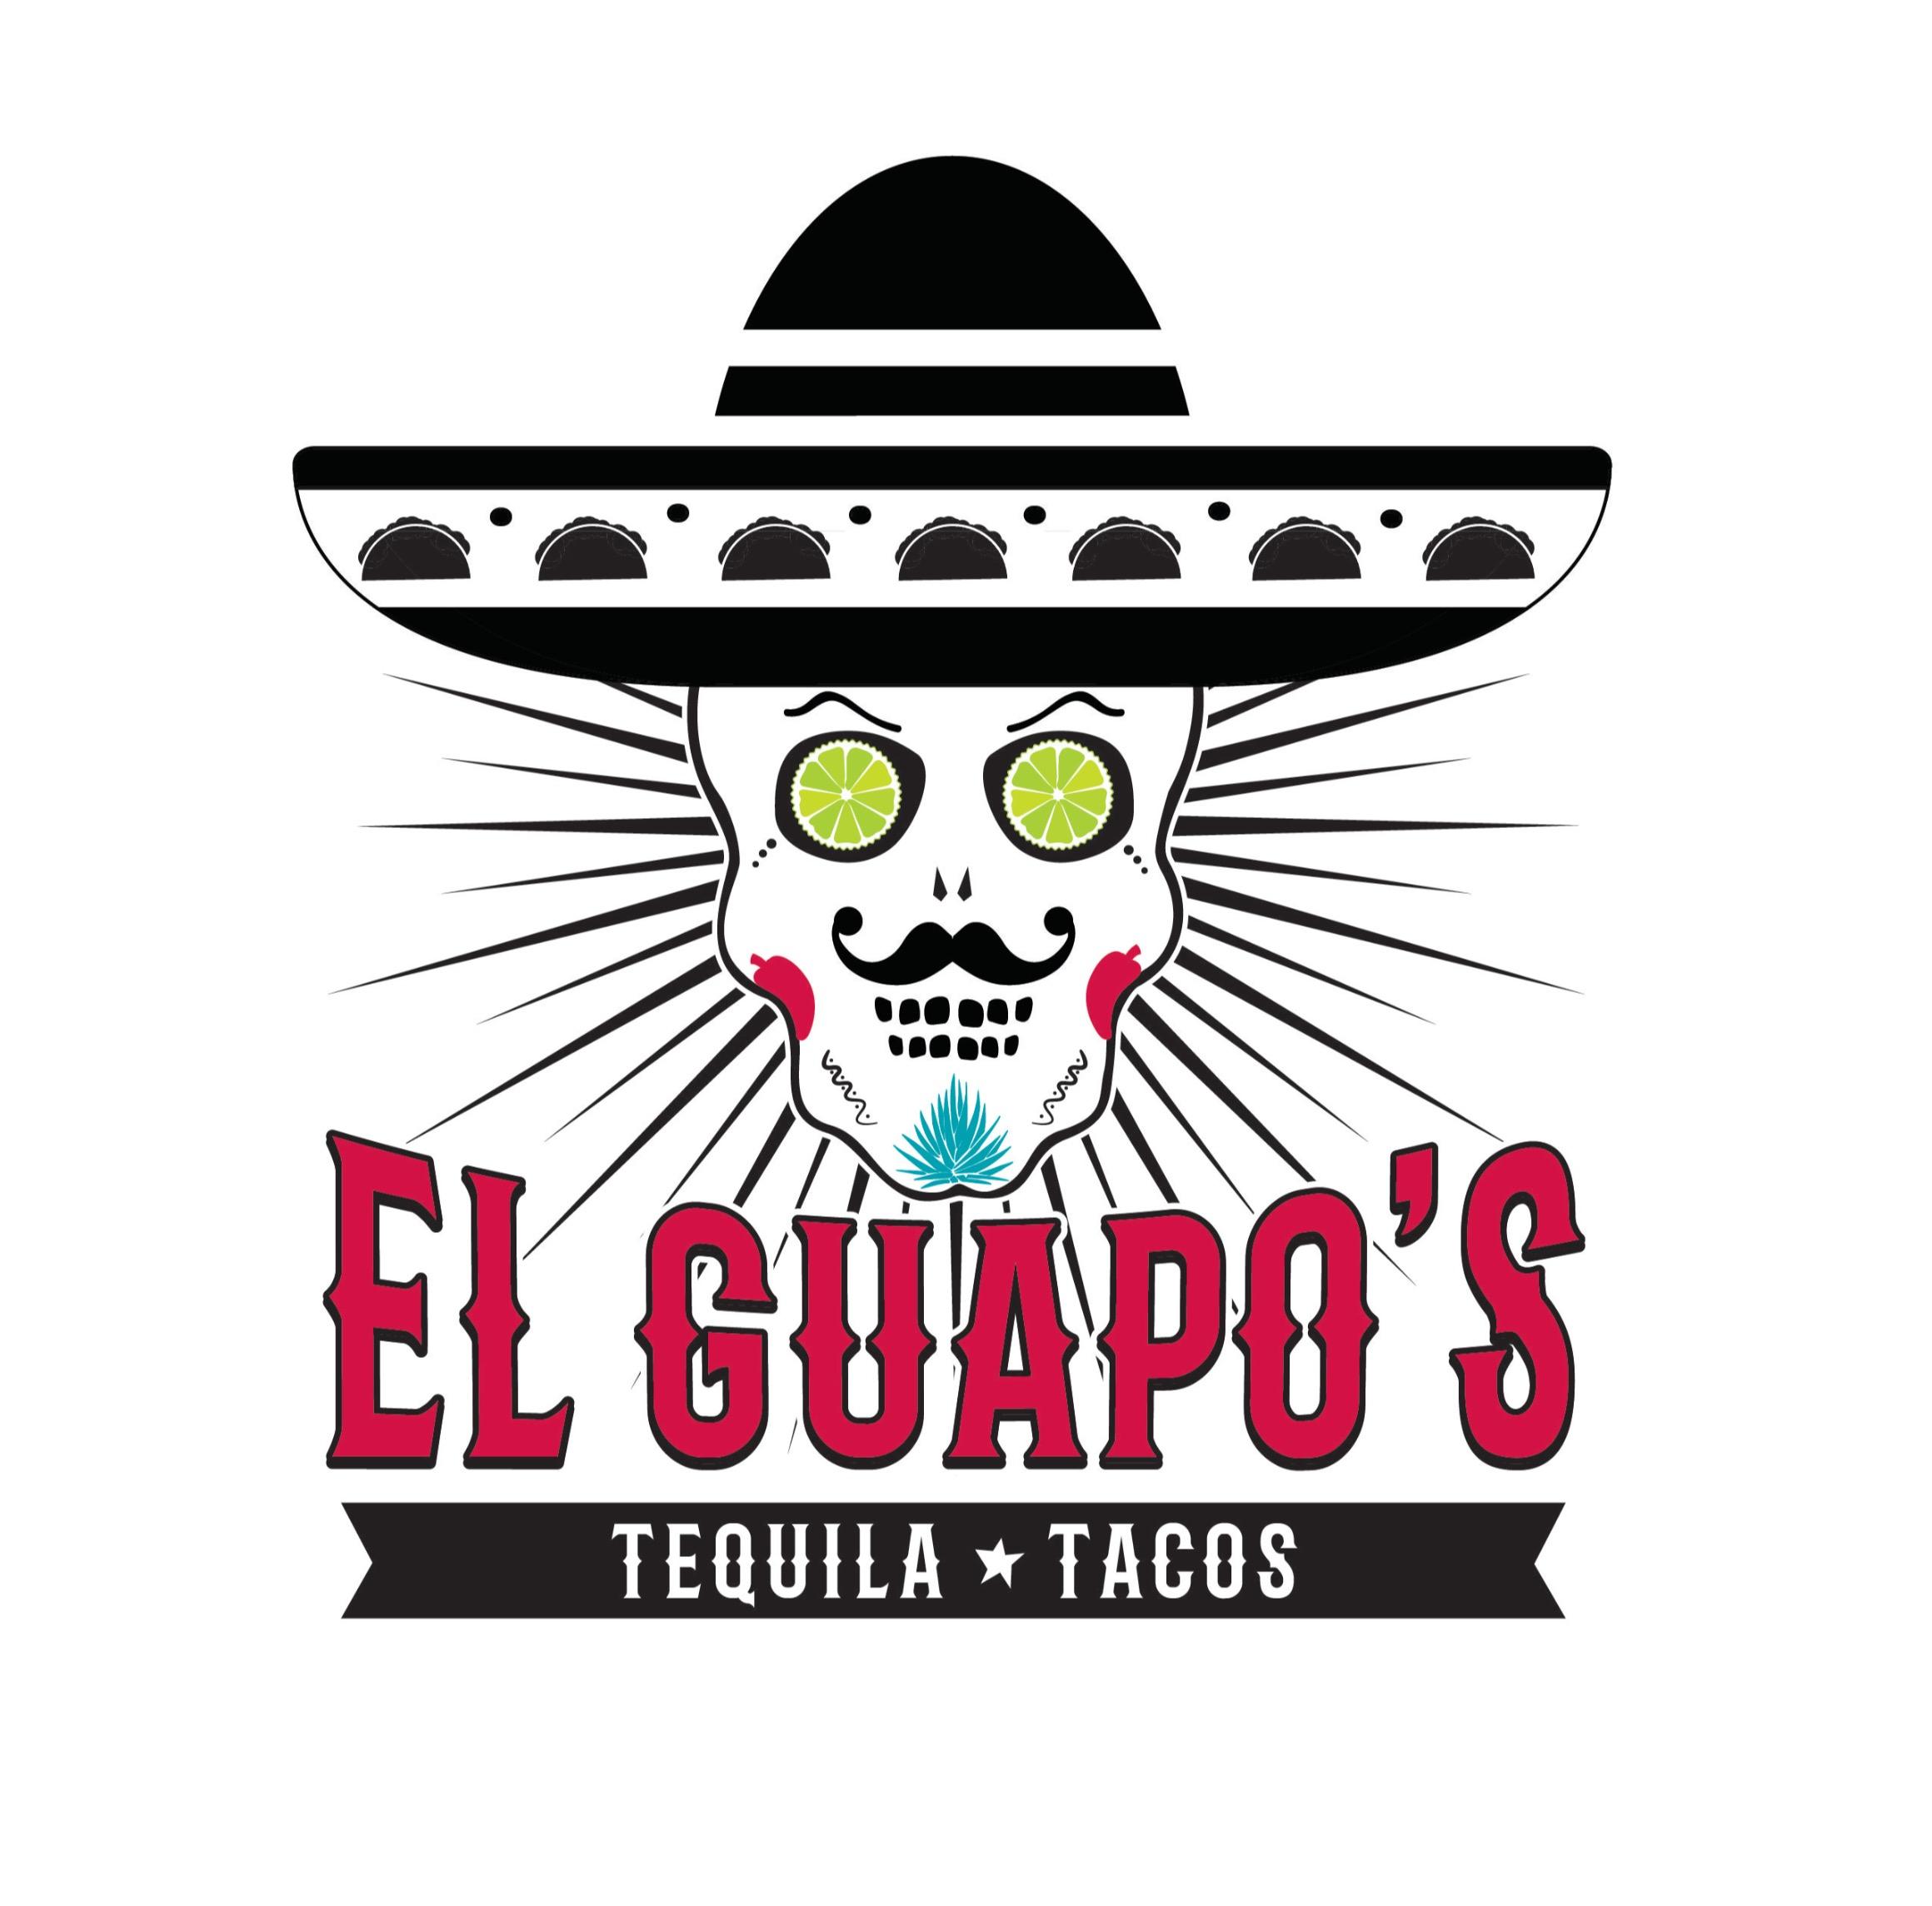 El Guapo's logo